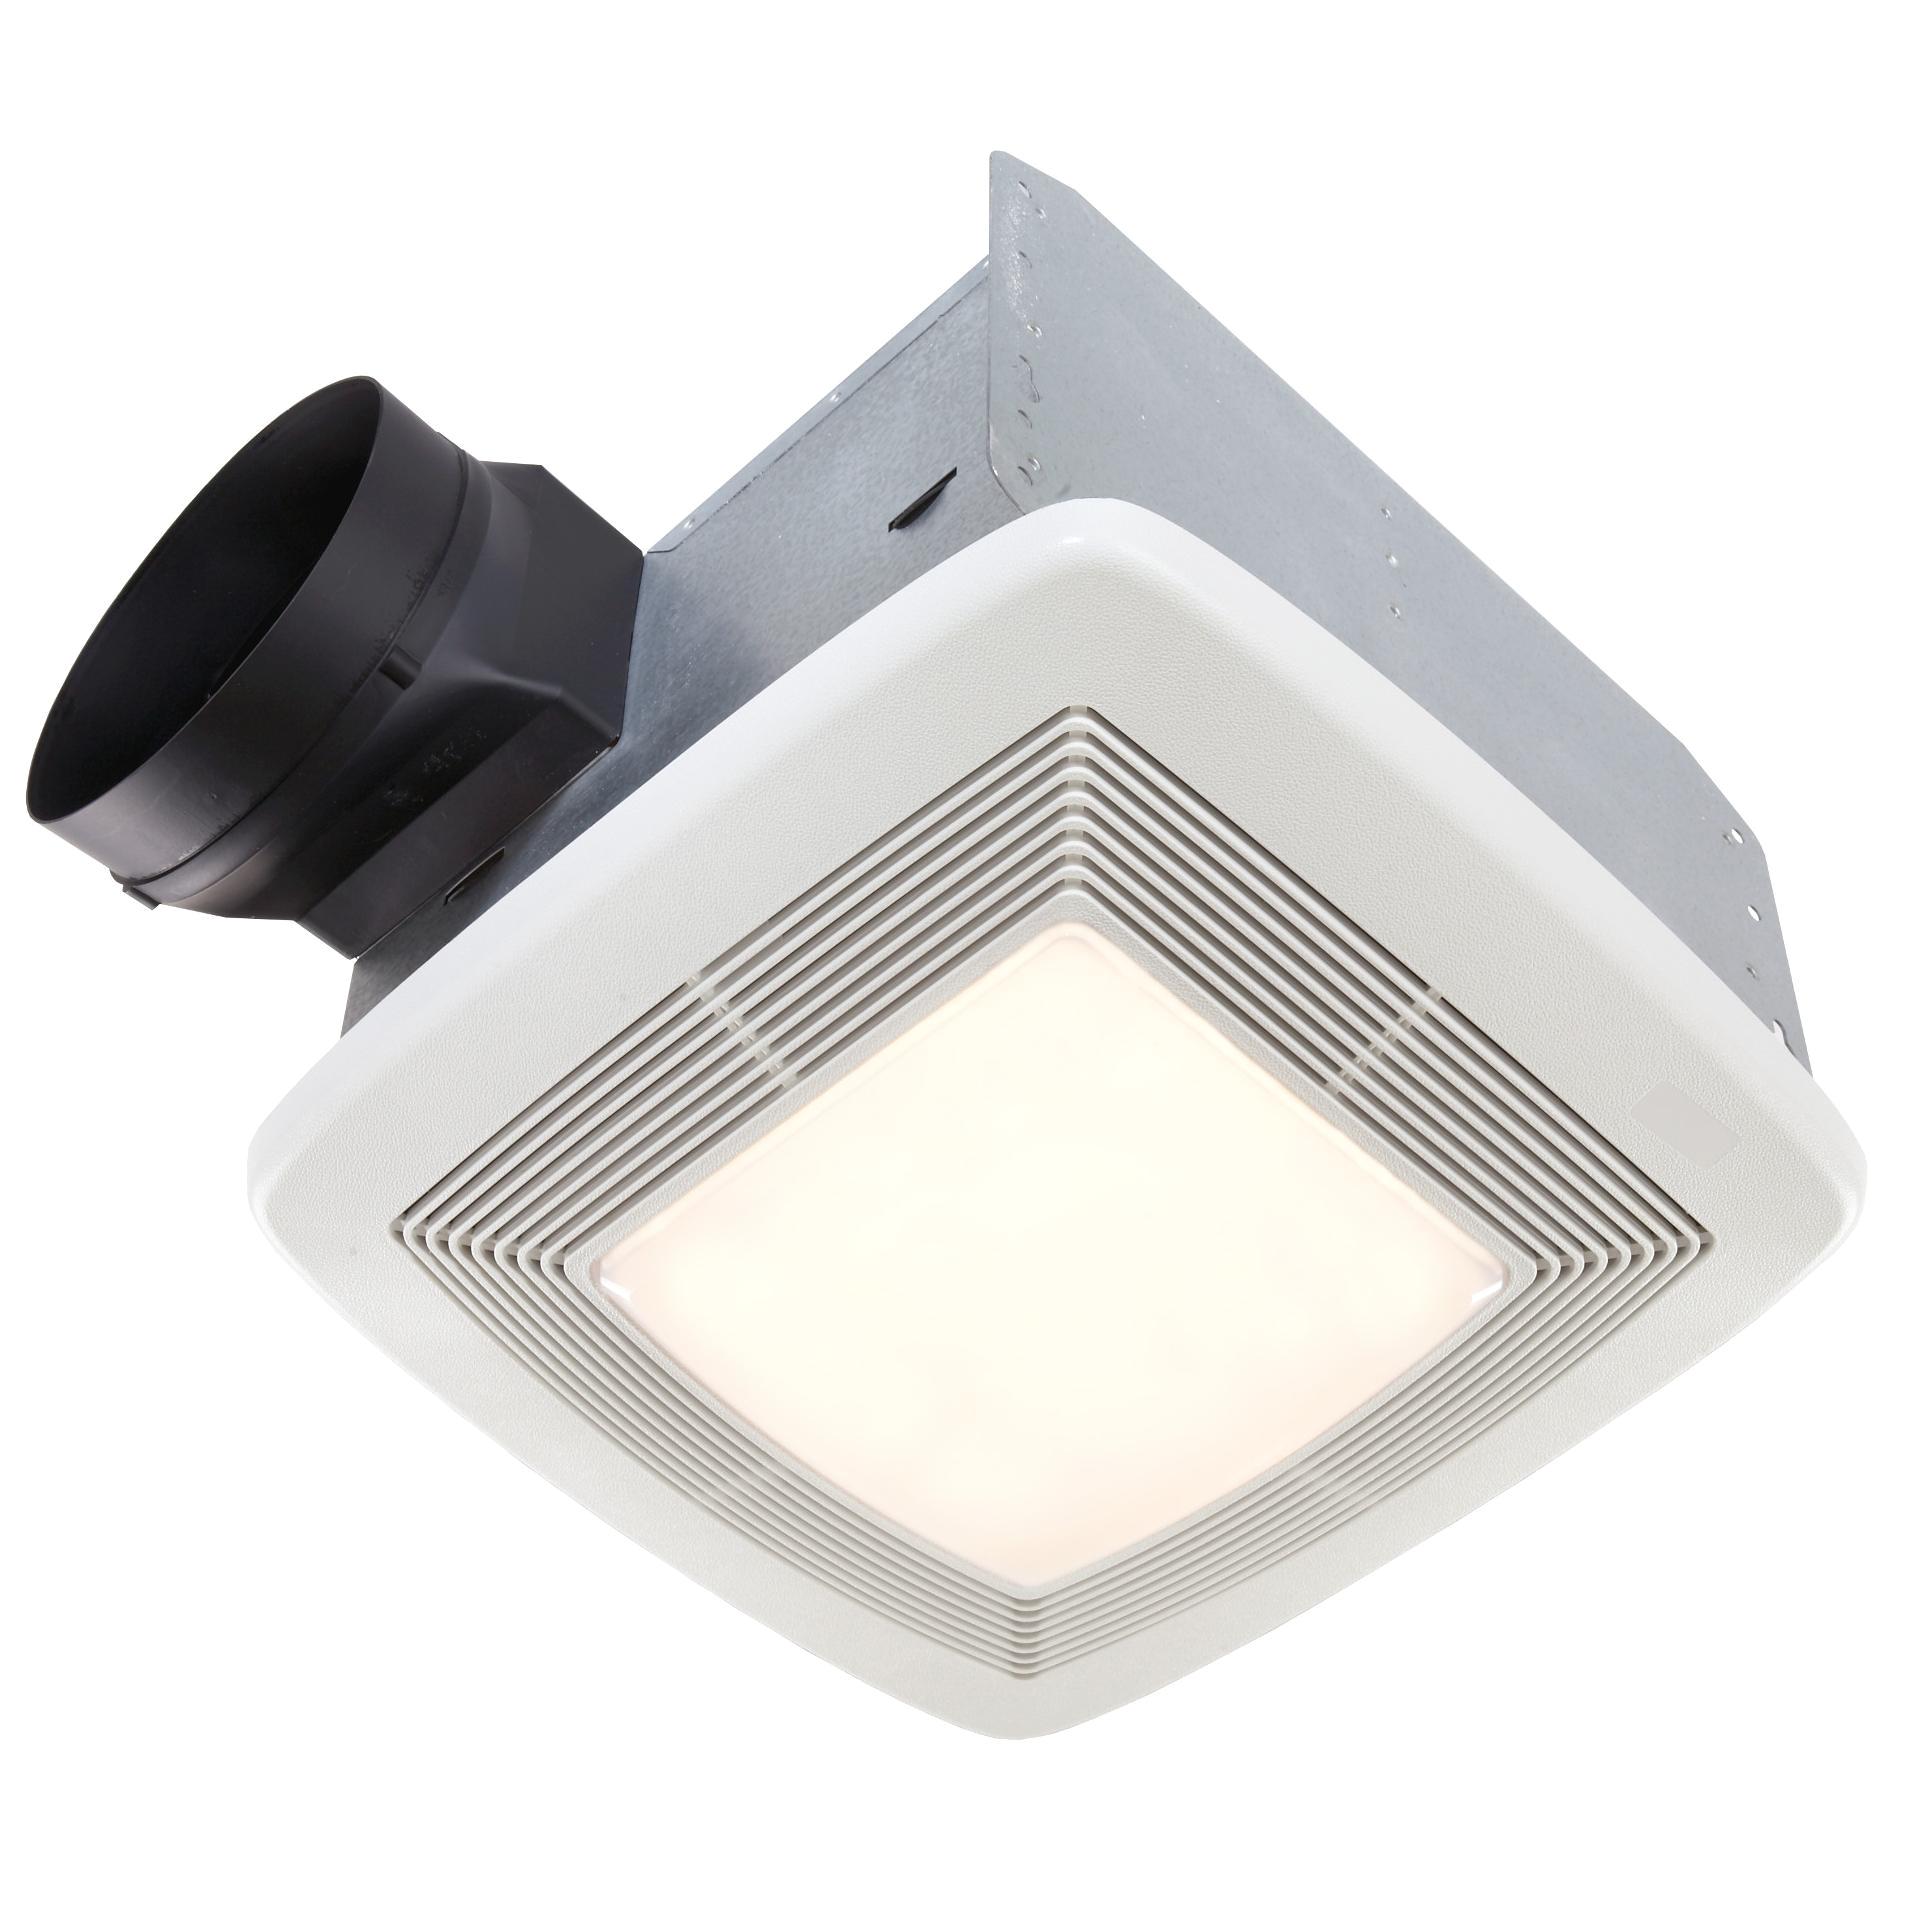 broan nutone qtxe110flt ultra silent bathroom fan light night light